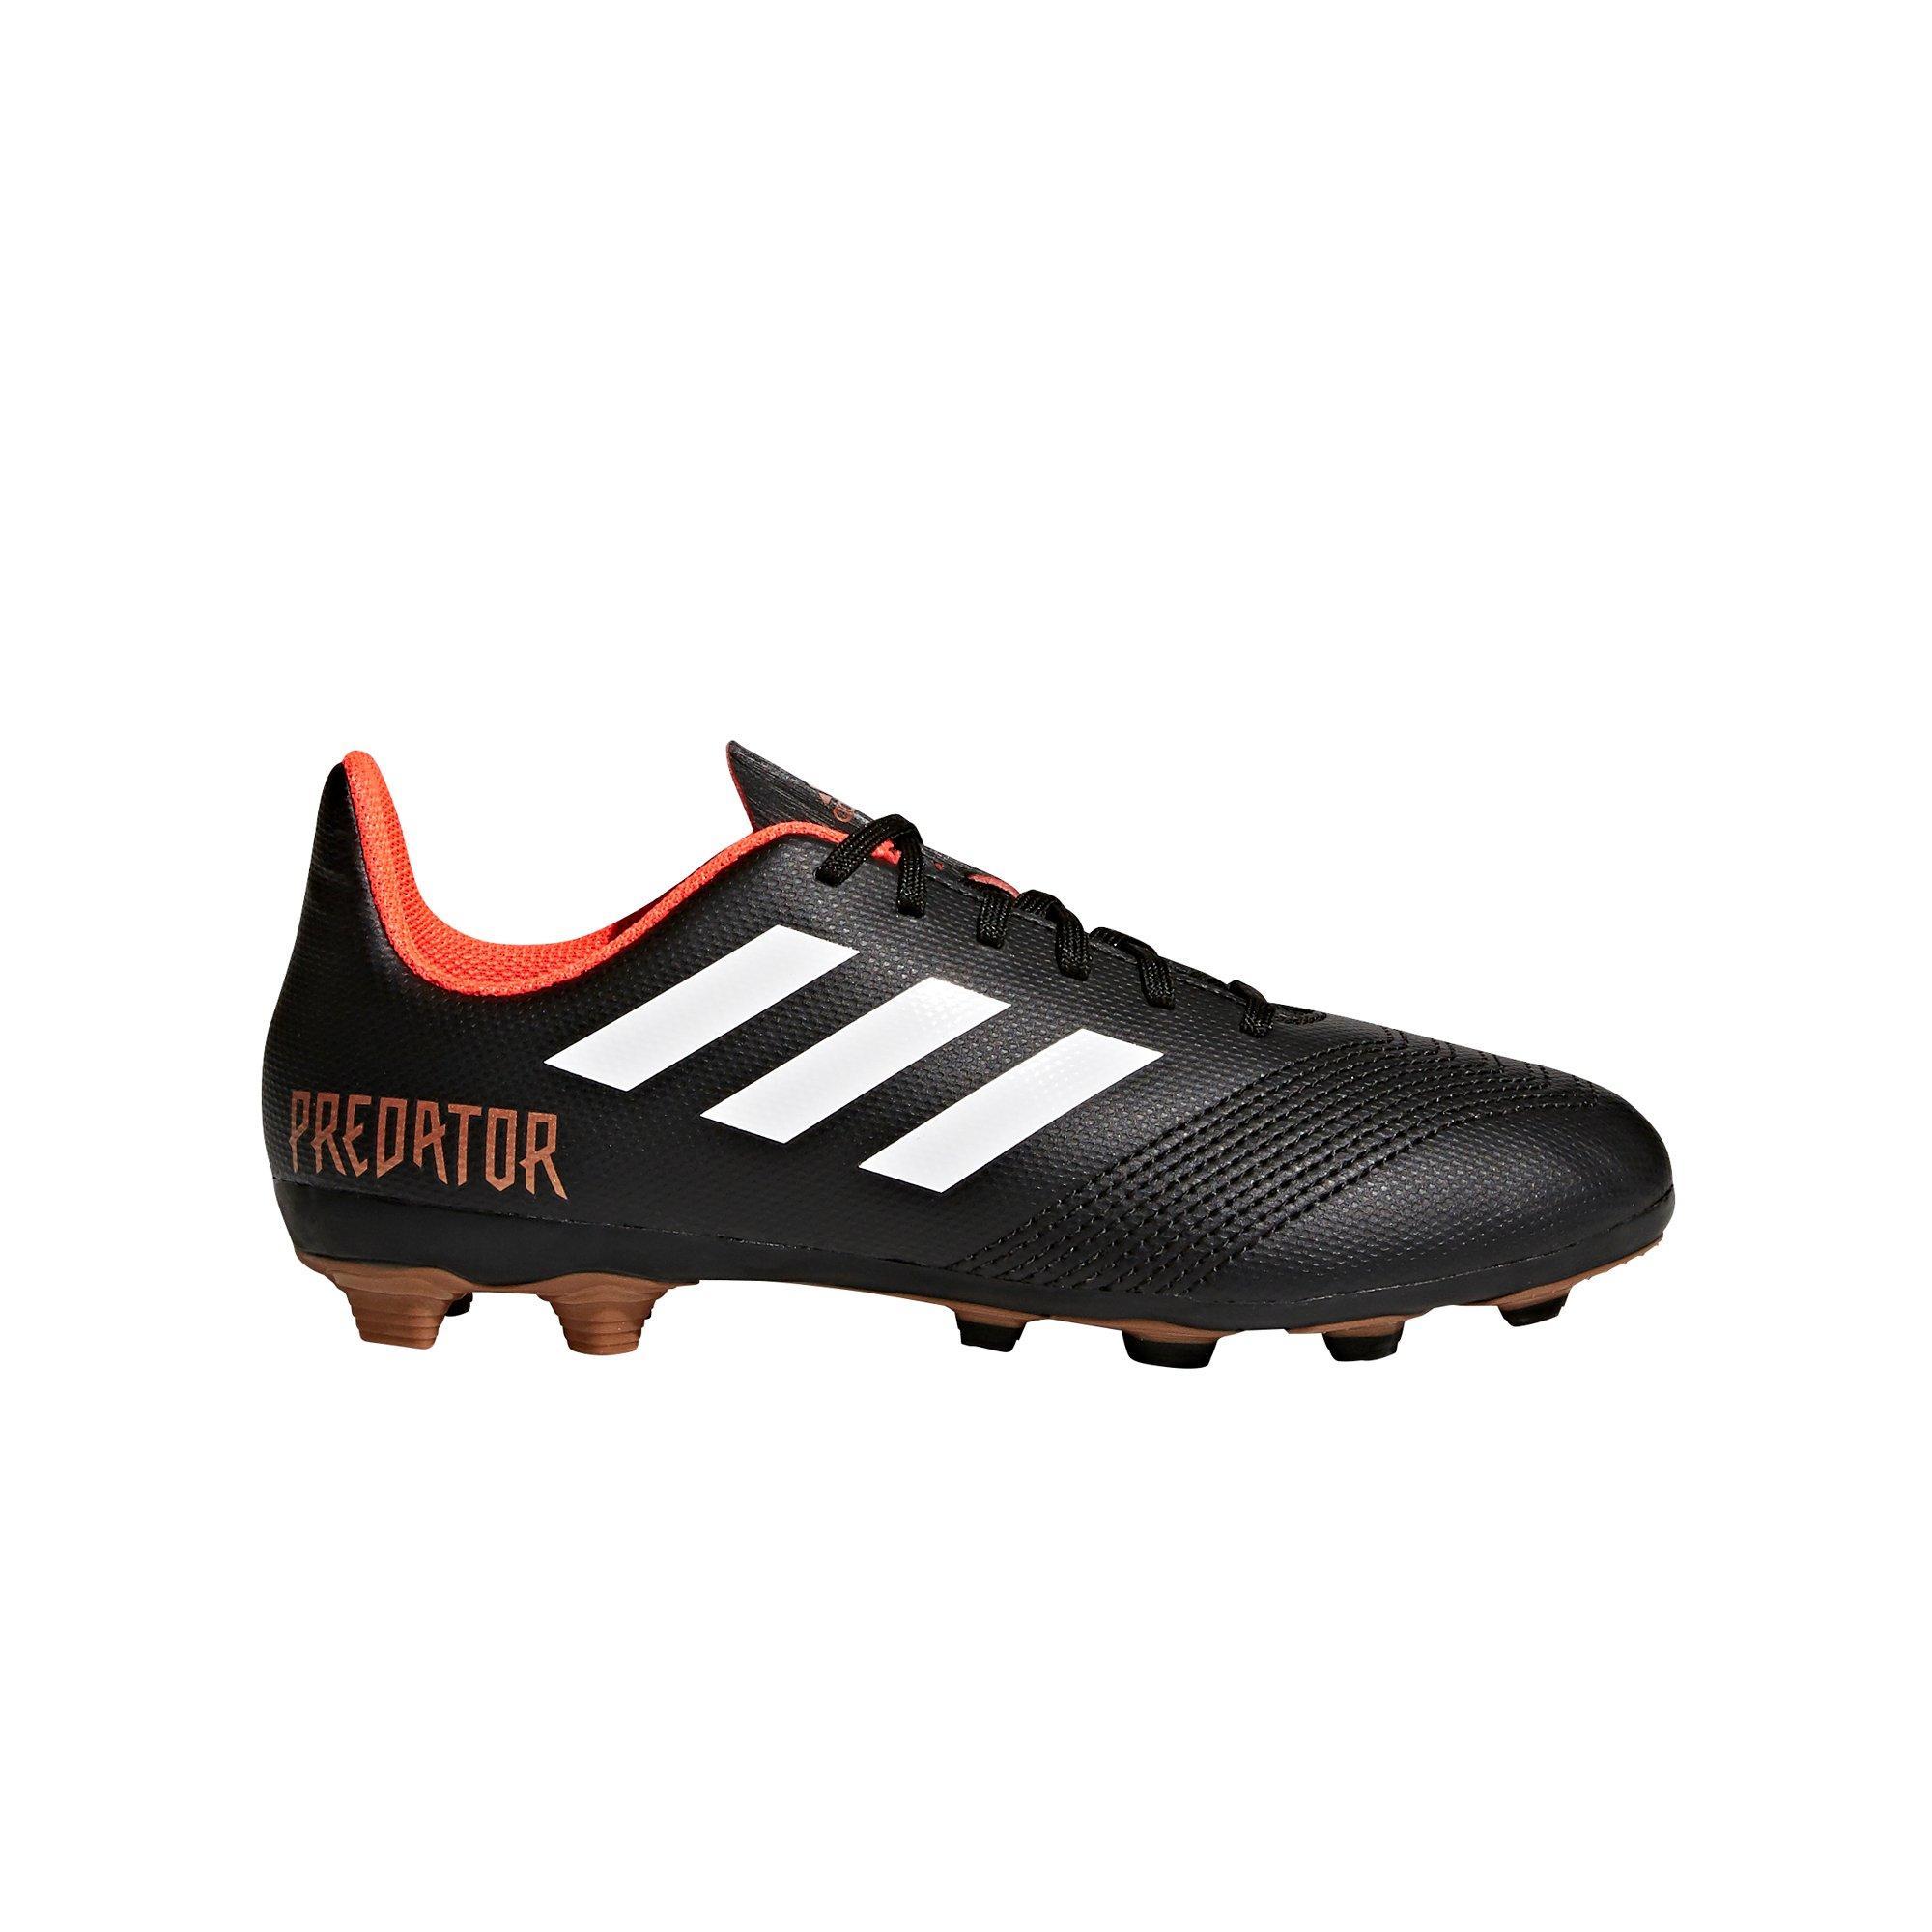 ... Kid\u0027s Soccer Cleats. Standard Price$60.00 Sale Price$29.97.: (0)